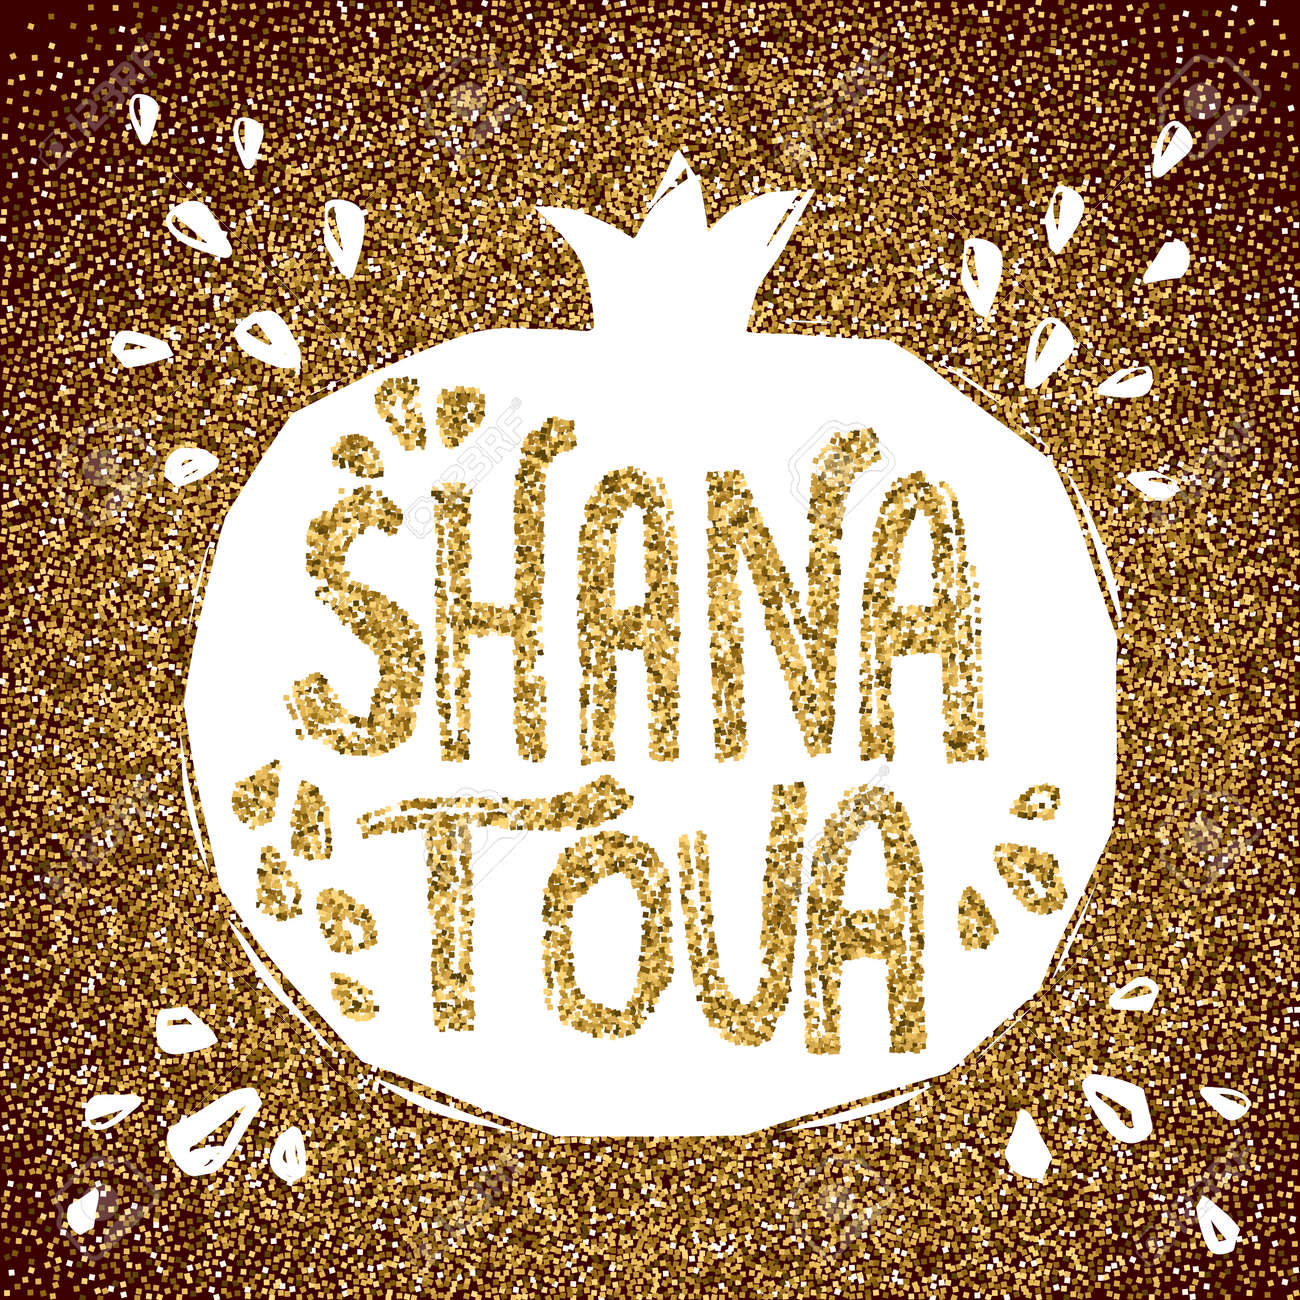 Rosh Hashanah Greeting Card With Pomegranate Shana Tova Or Jewish Royalty Free Cliparts Vectors And Stock Illustration Image 62325738